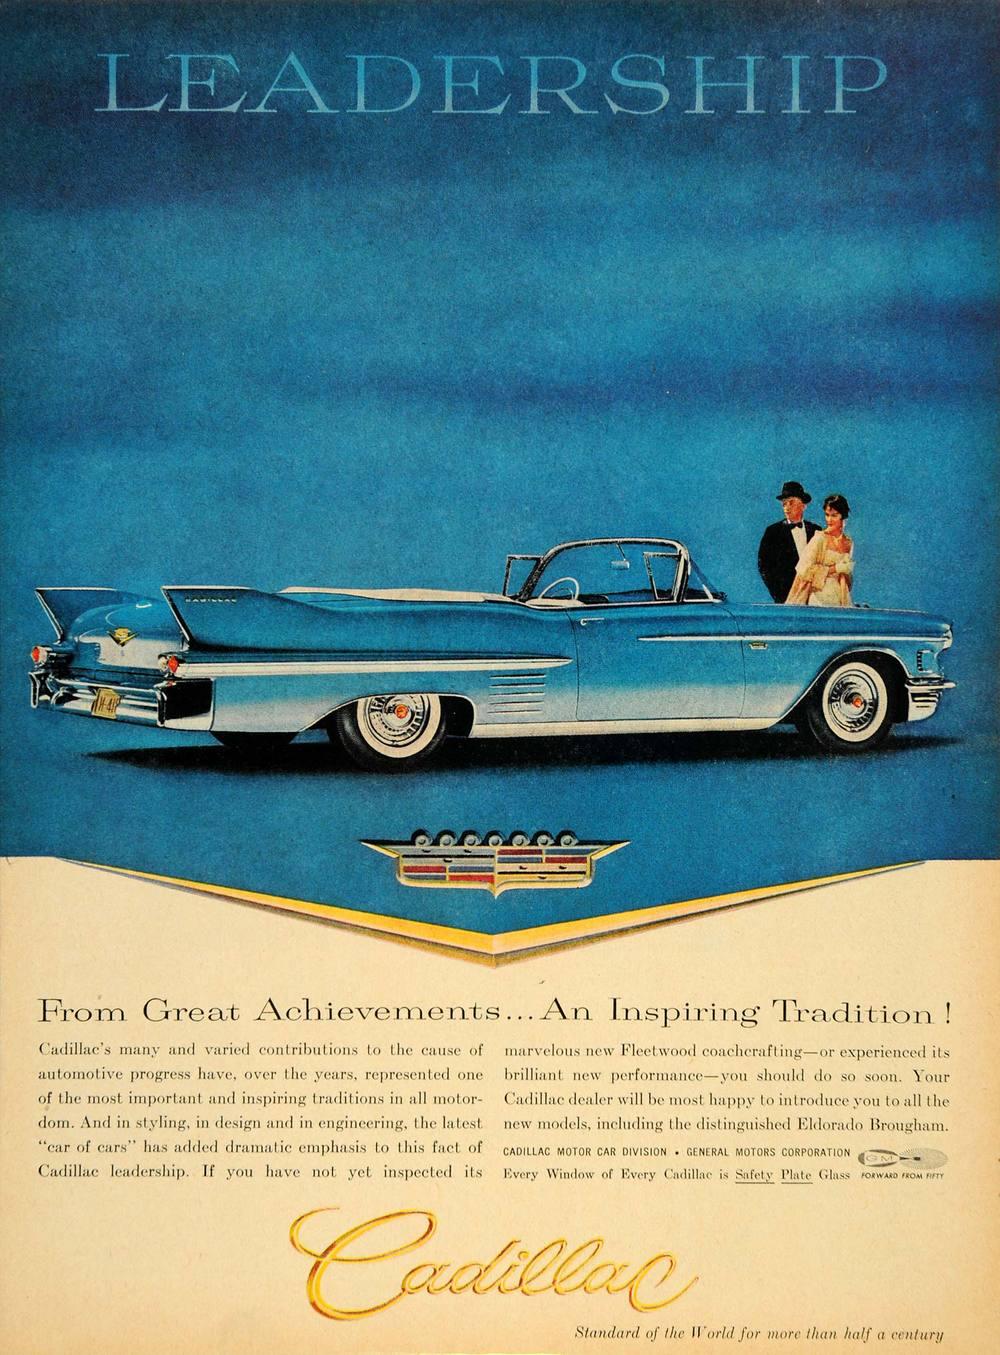 1950 59 Specs Cadillac Cruiser 1951 Fleetwood Sedan 1957